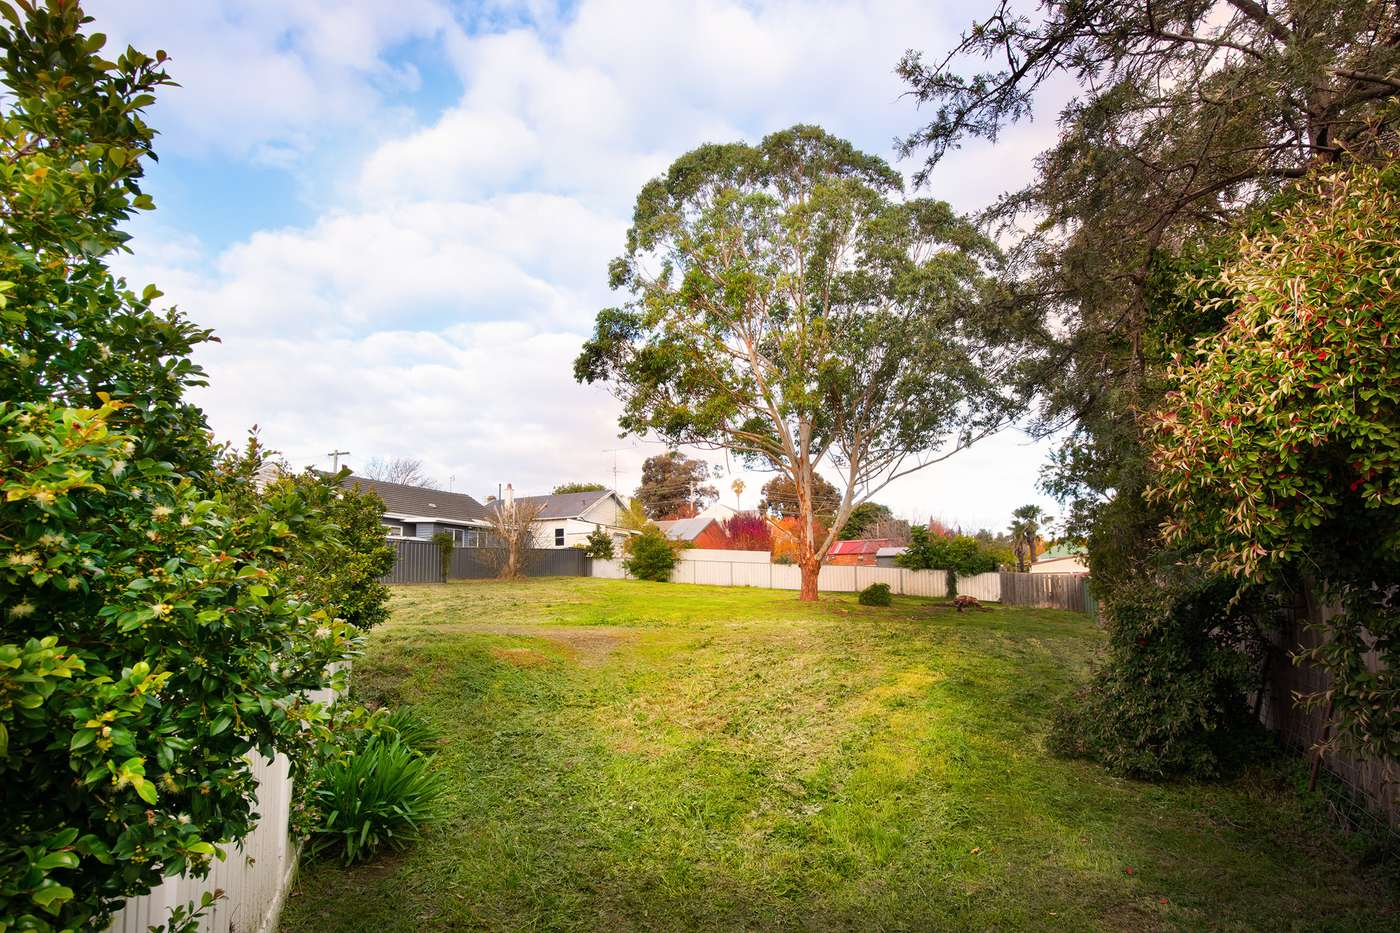 Main view of Homely  listing, 9 Atkinson Street, Bendigo, VIC 3550